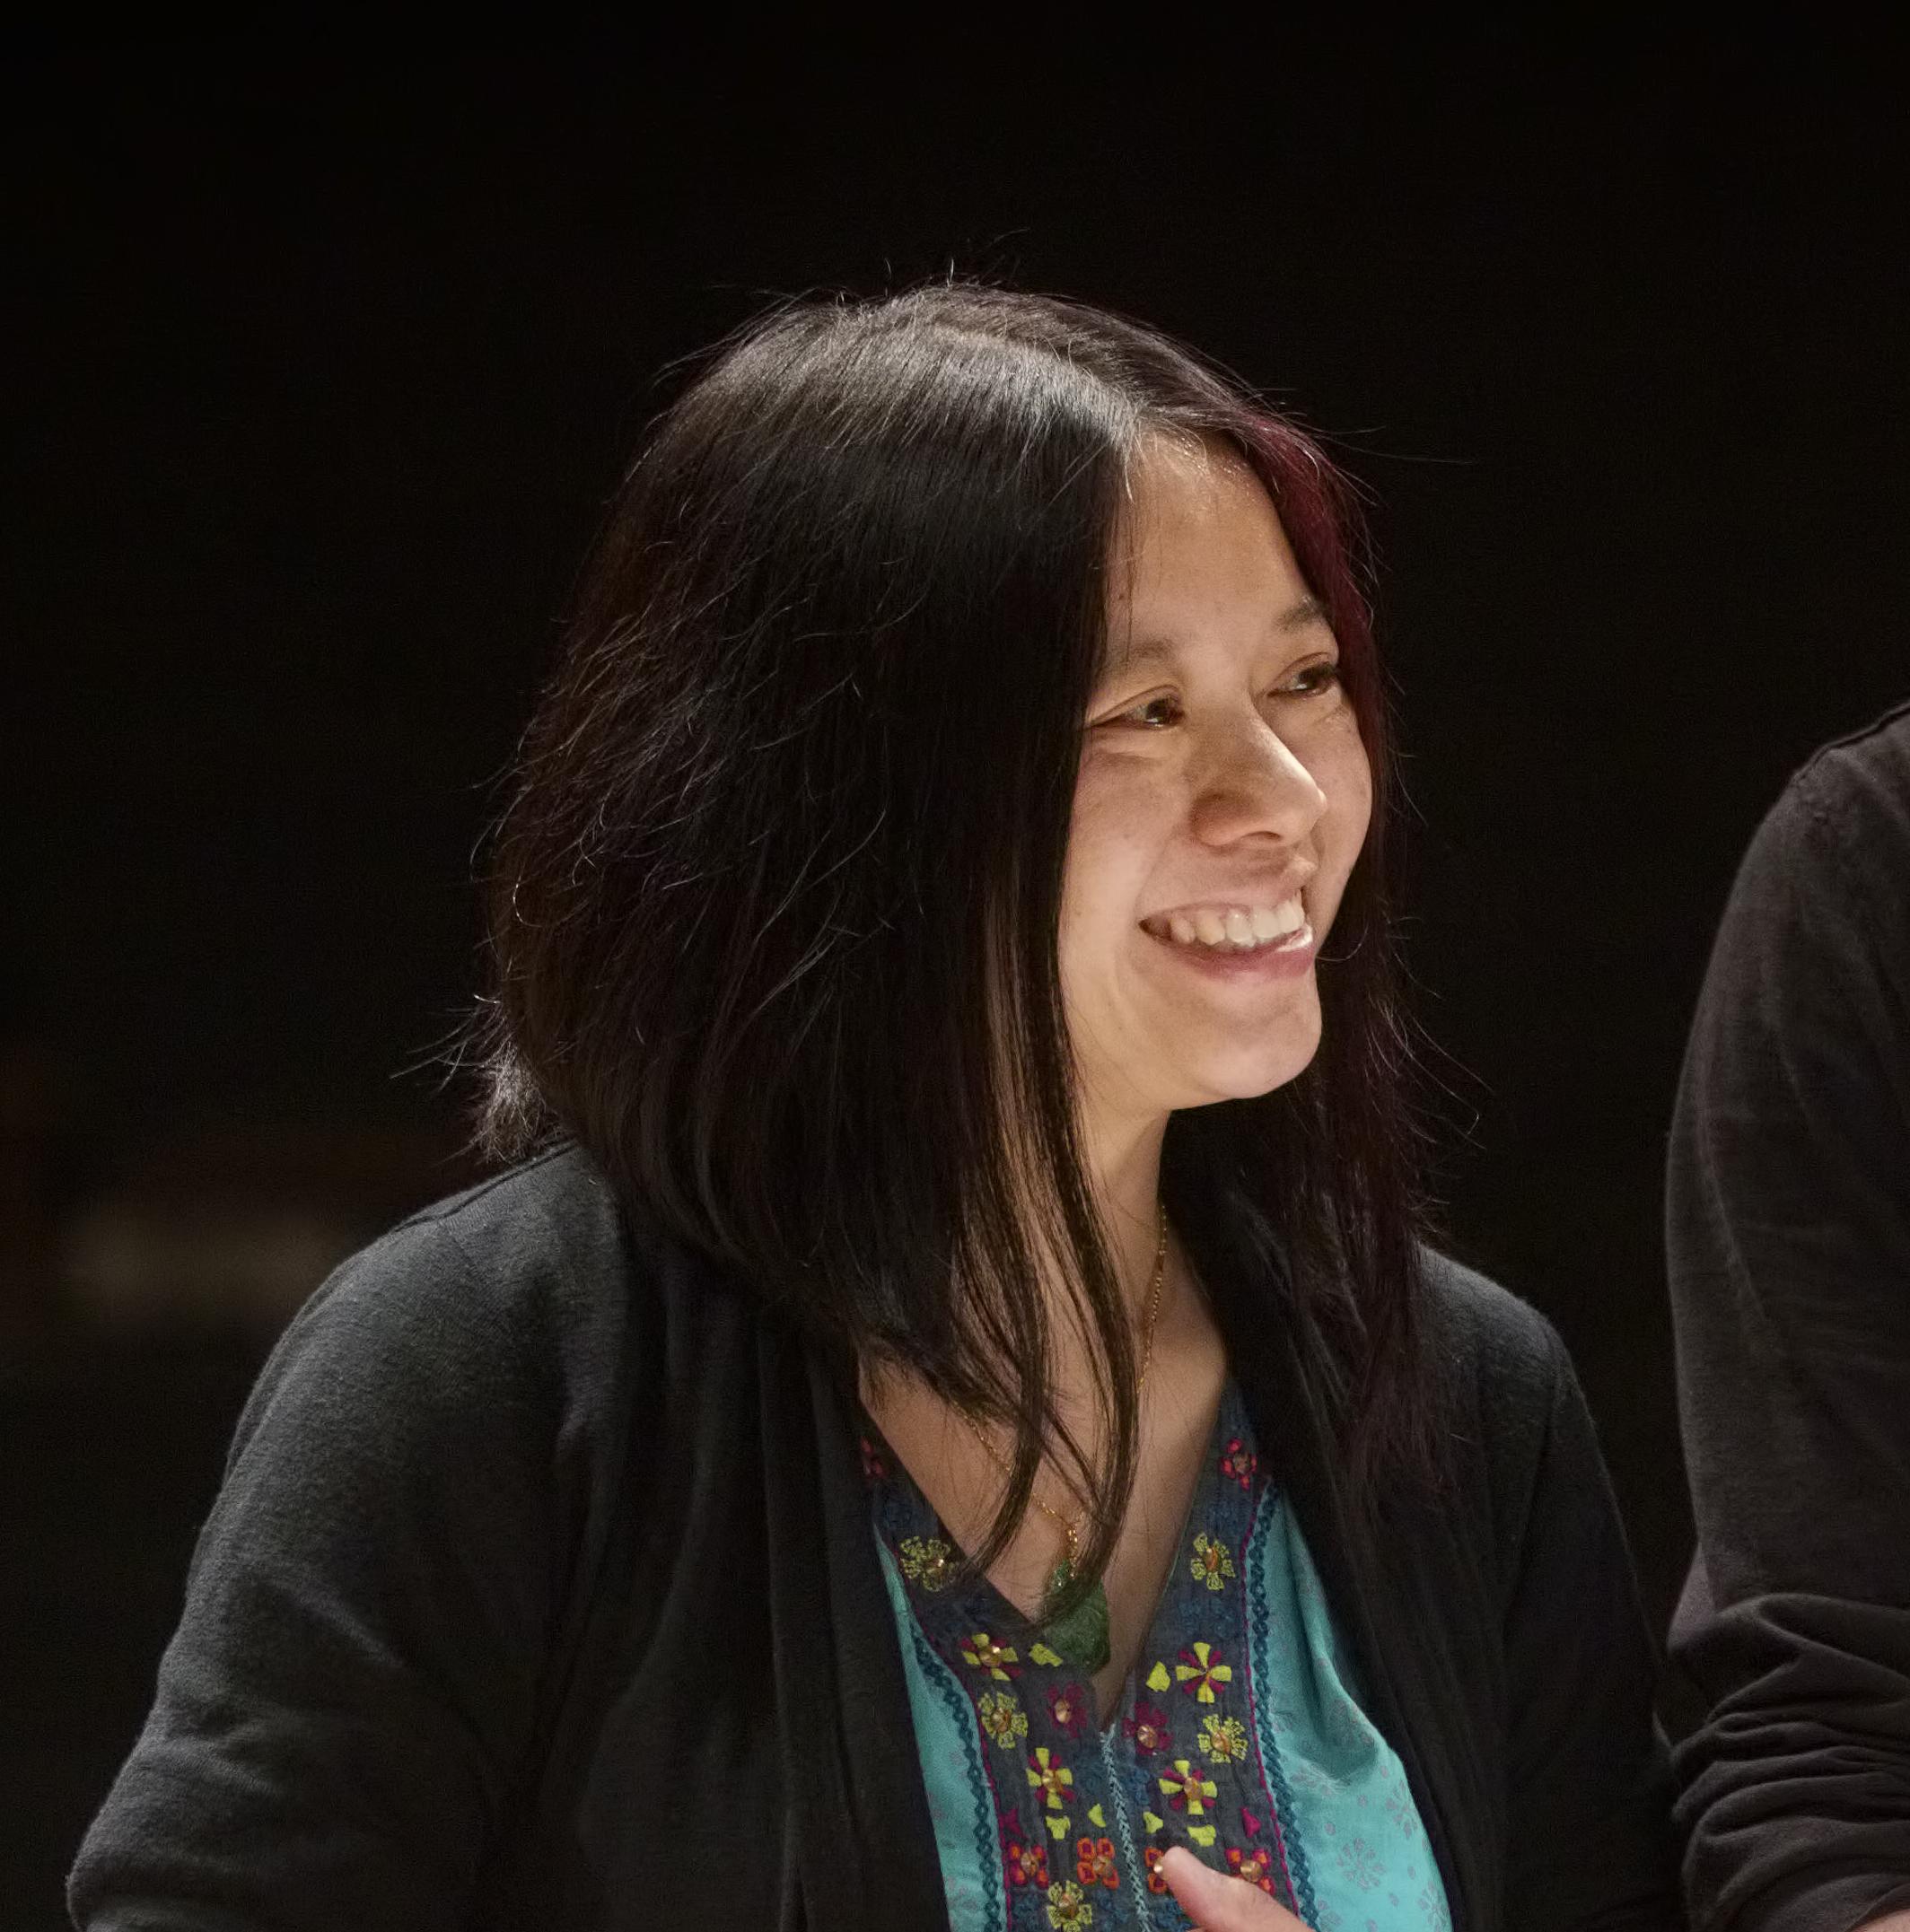 Liza Lim, photo by Klaus Rudolf